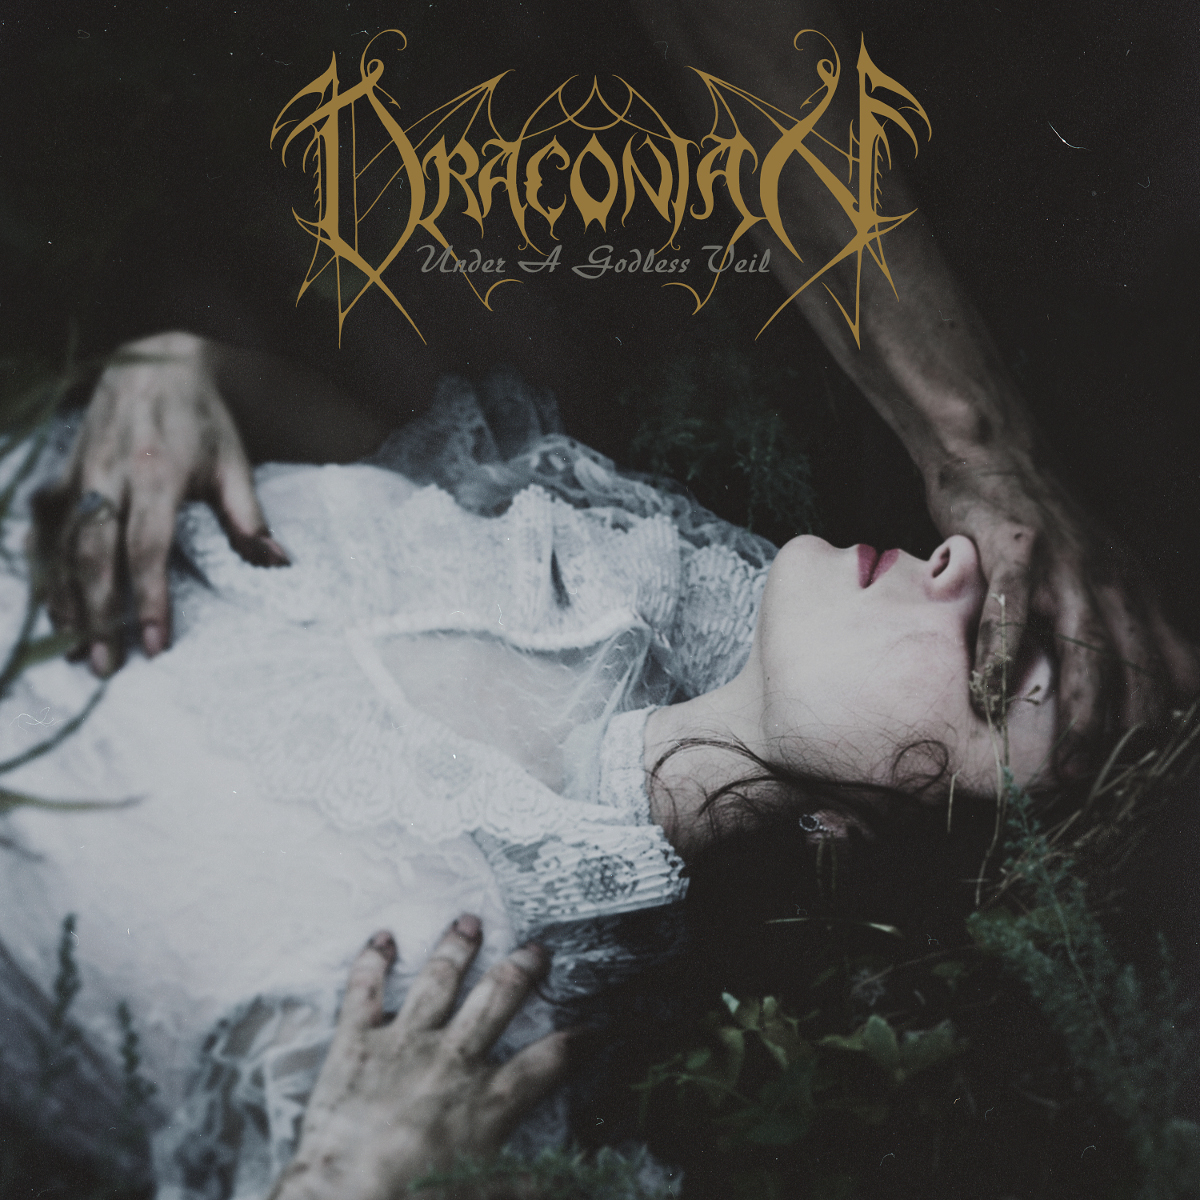 draconian_cover.jpg